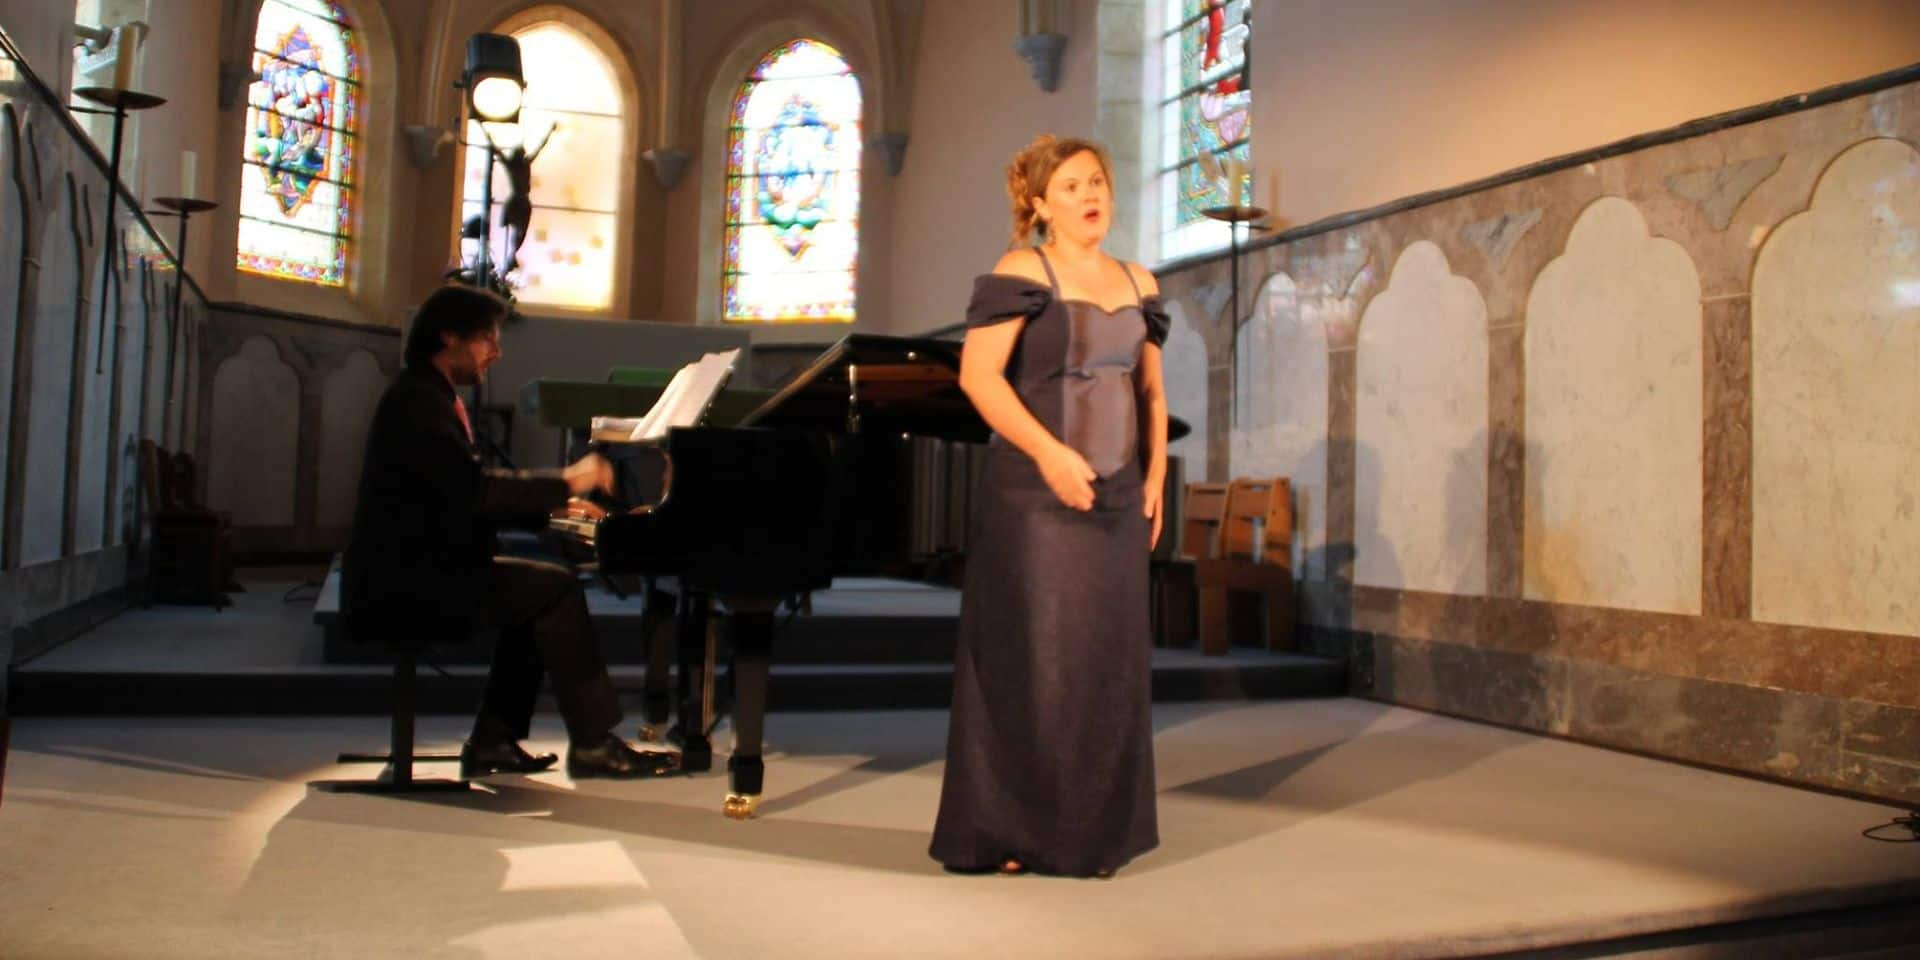 La mezzo-soprano Julie Bailly chantera au Marché de Noël de Jemeppe-sur-Sambre